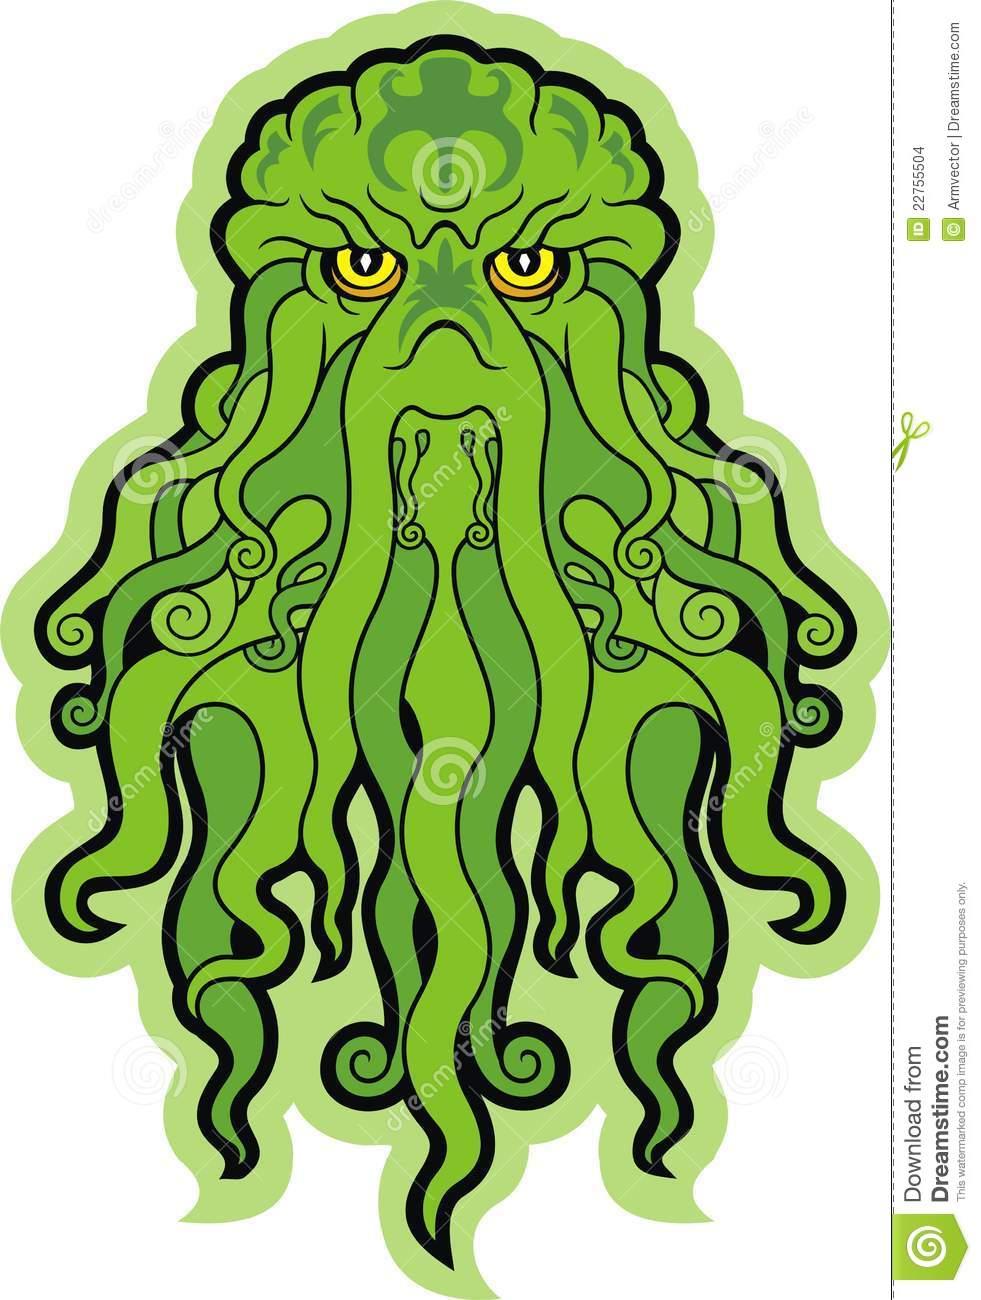 Sea monster clipart.